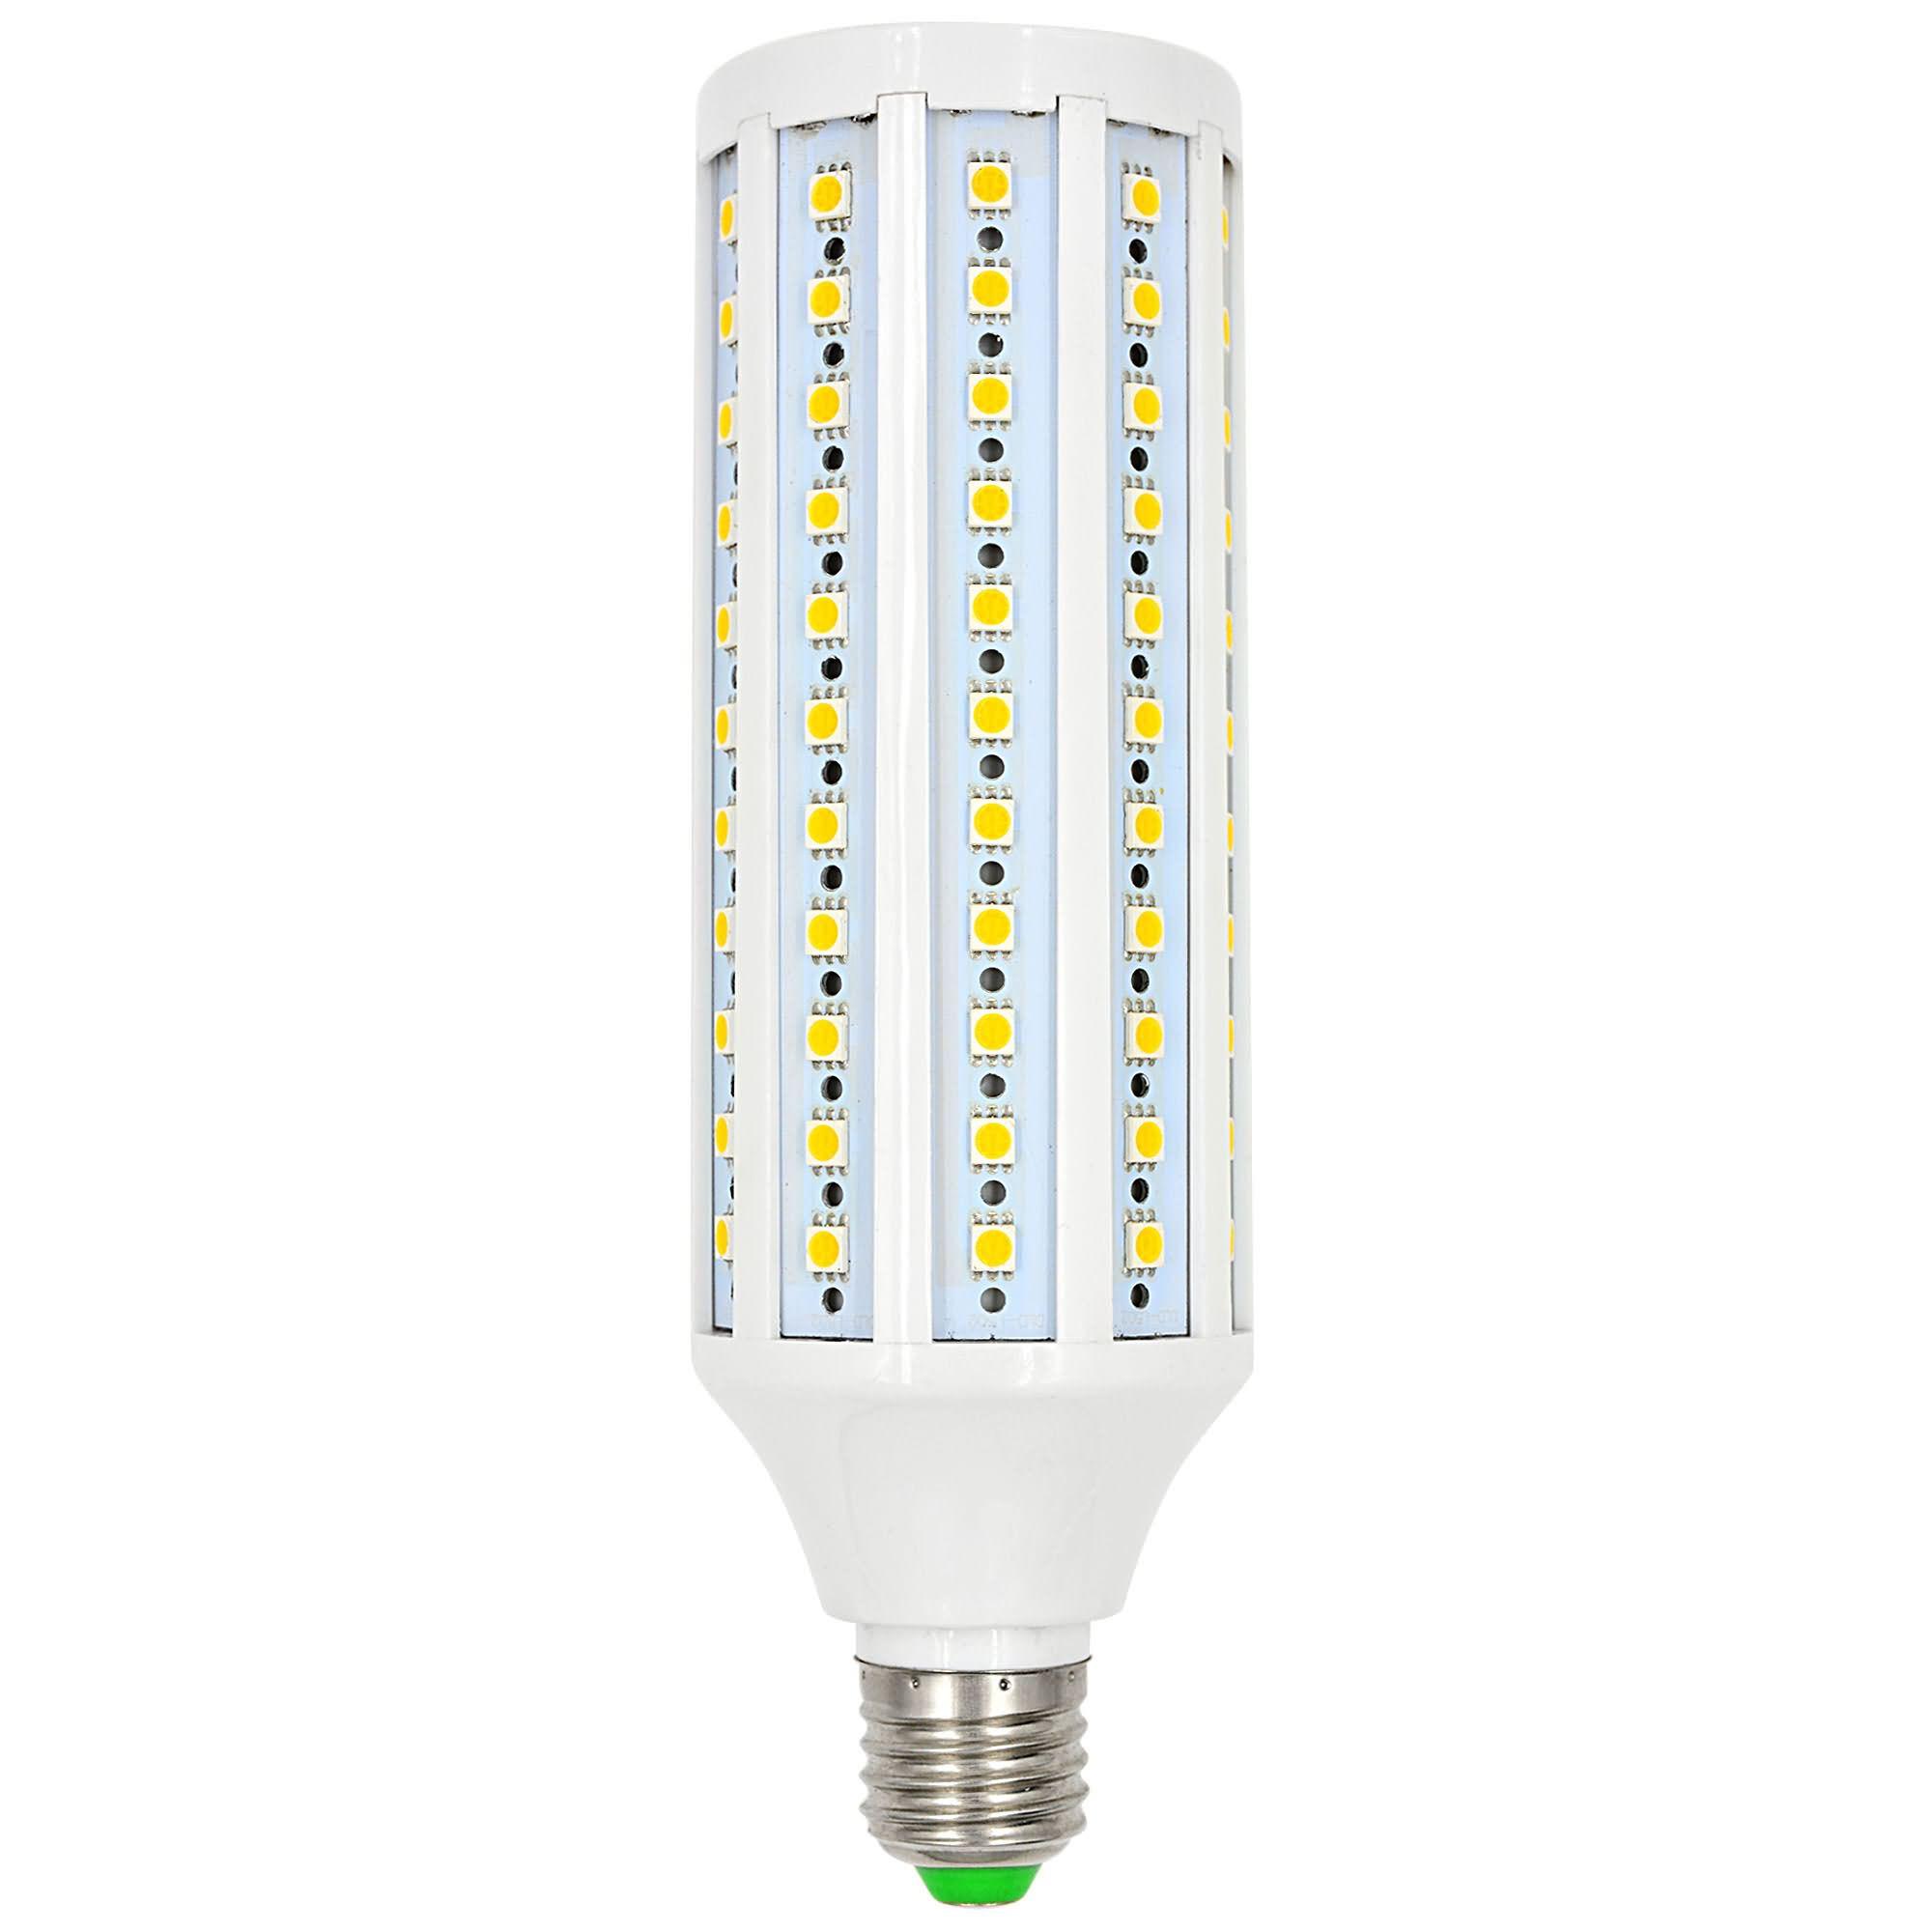 MENGS® E27 21W LED Corn Light 132x 5050 SMD LEDs LED Bulb In Cool White Energy-Saving Lamp